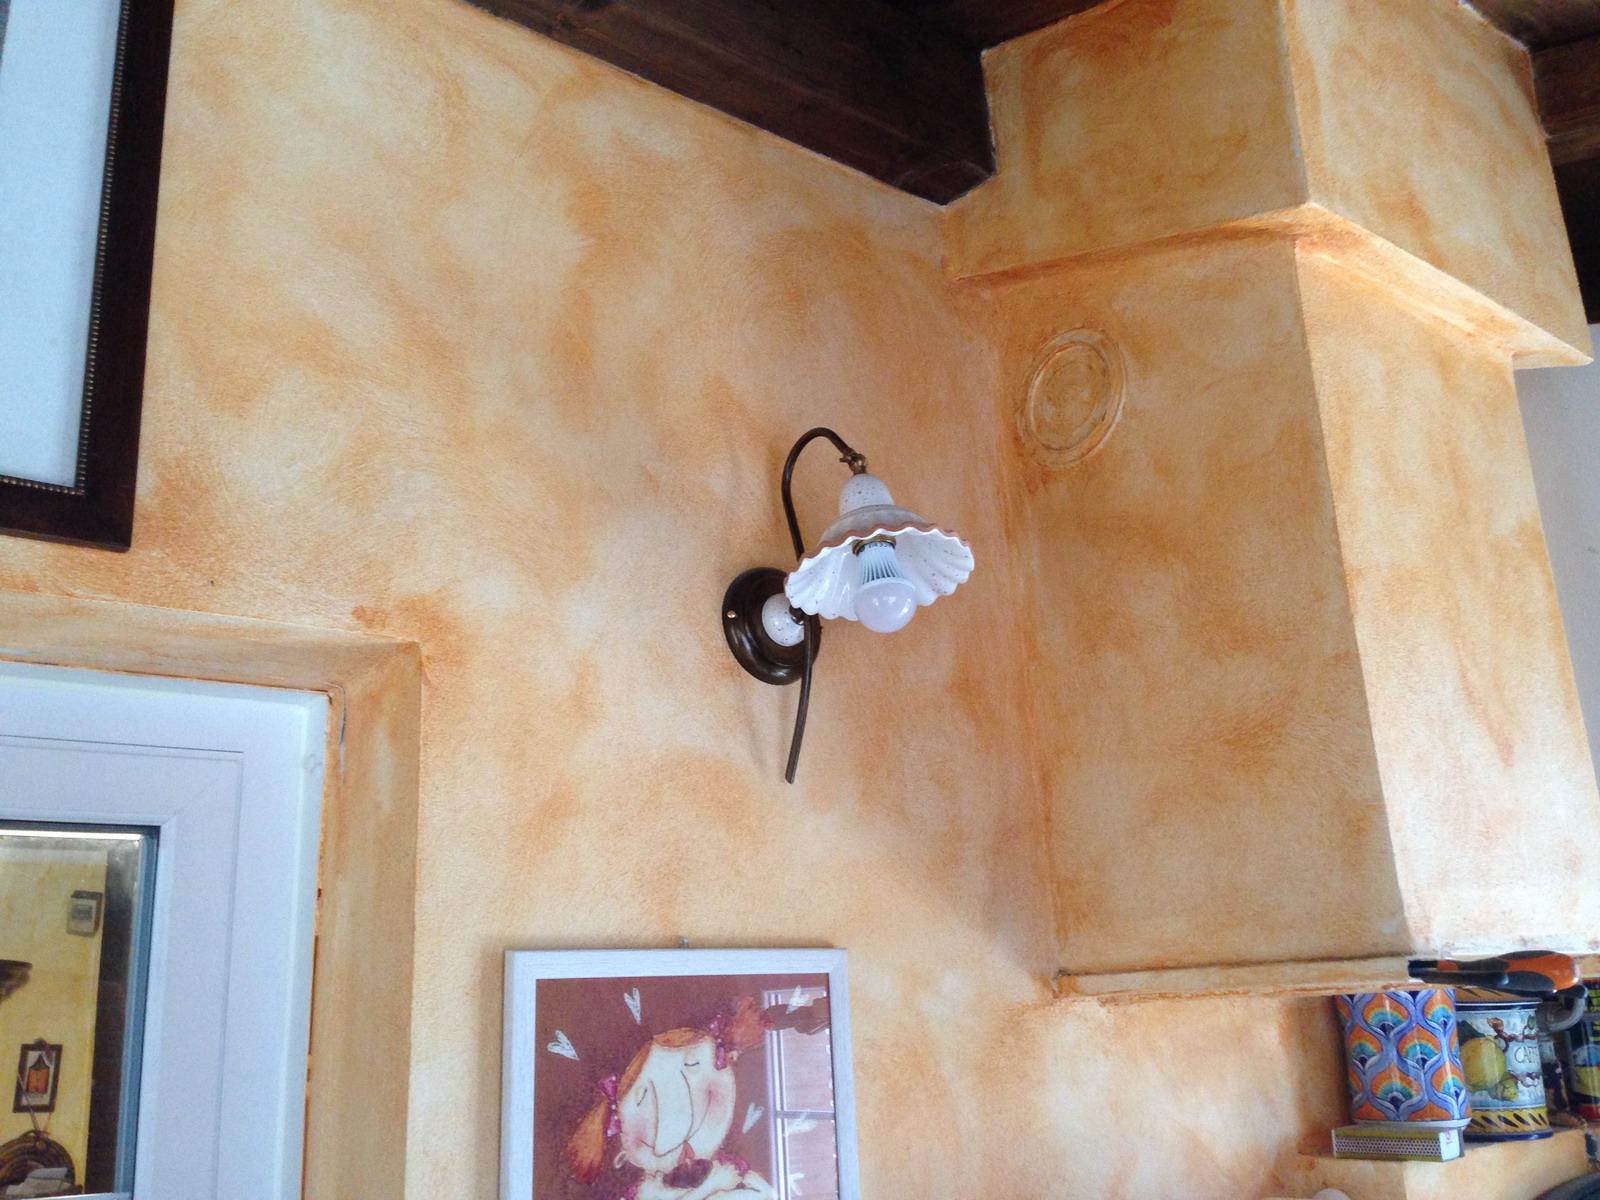 Taverna illuminazione lampadari e applique in ceramica fonderia innocenti - Impianti elettrici a vista per interni ...